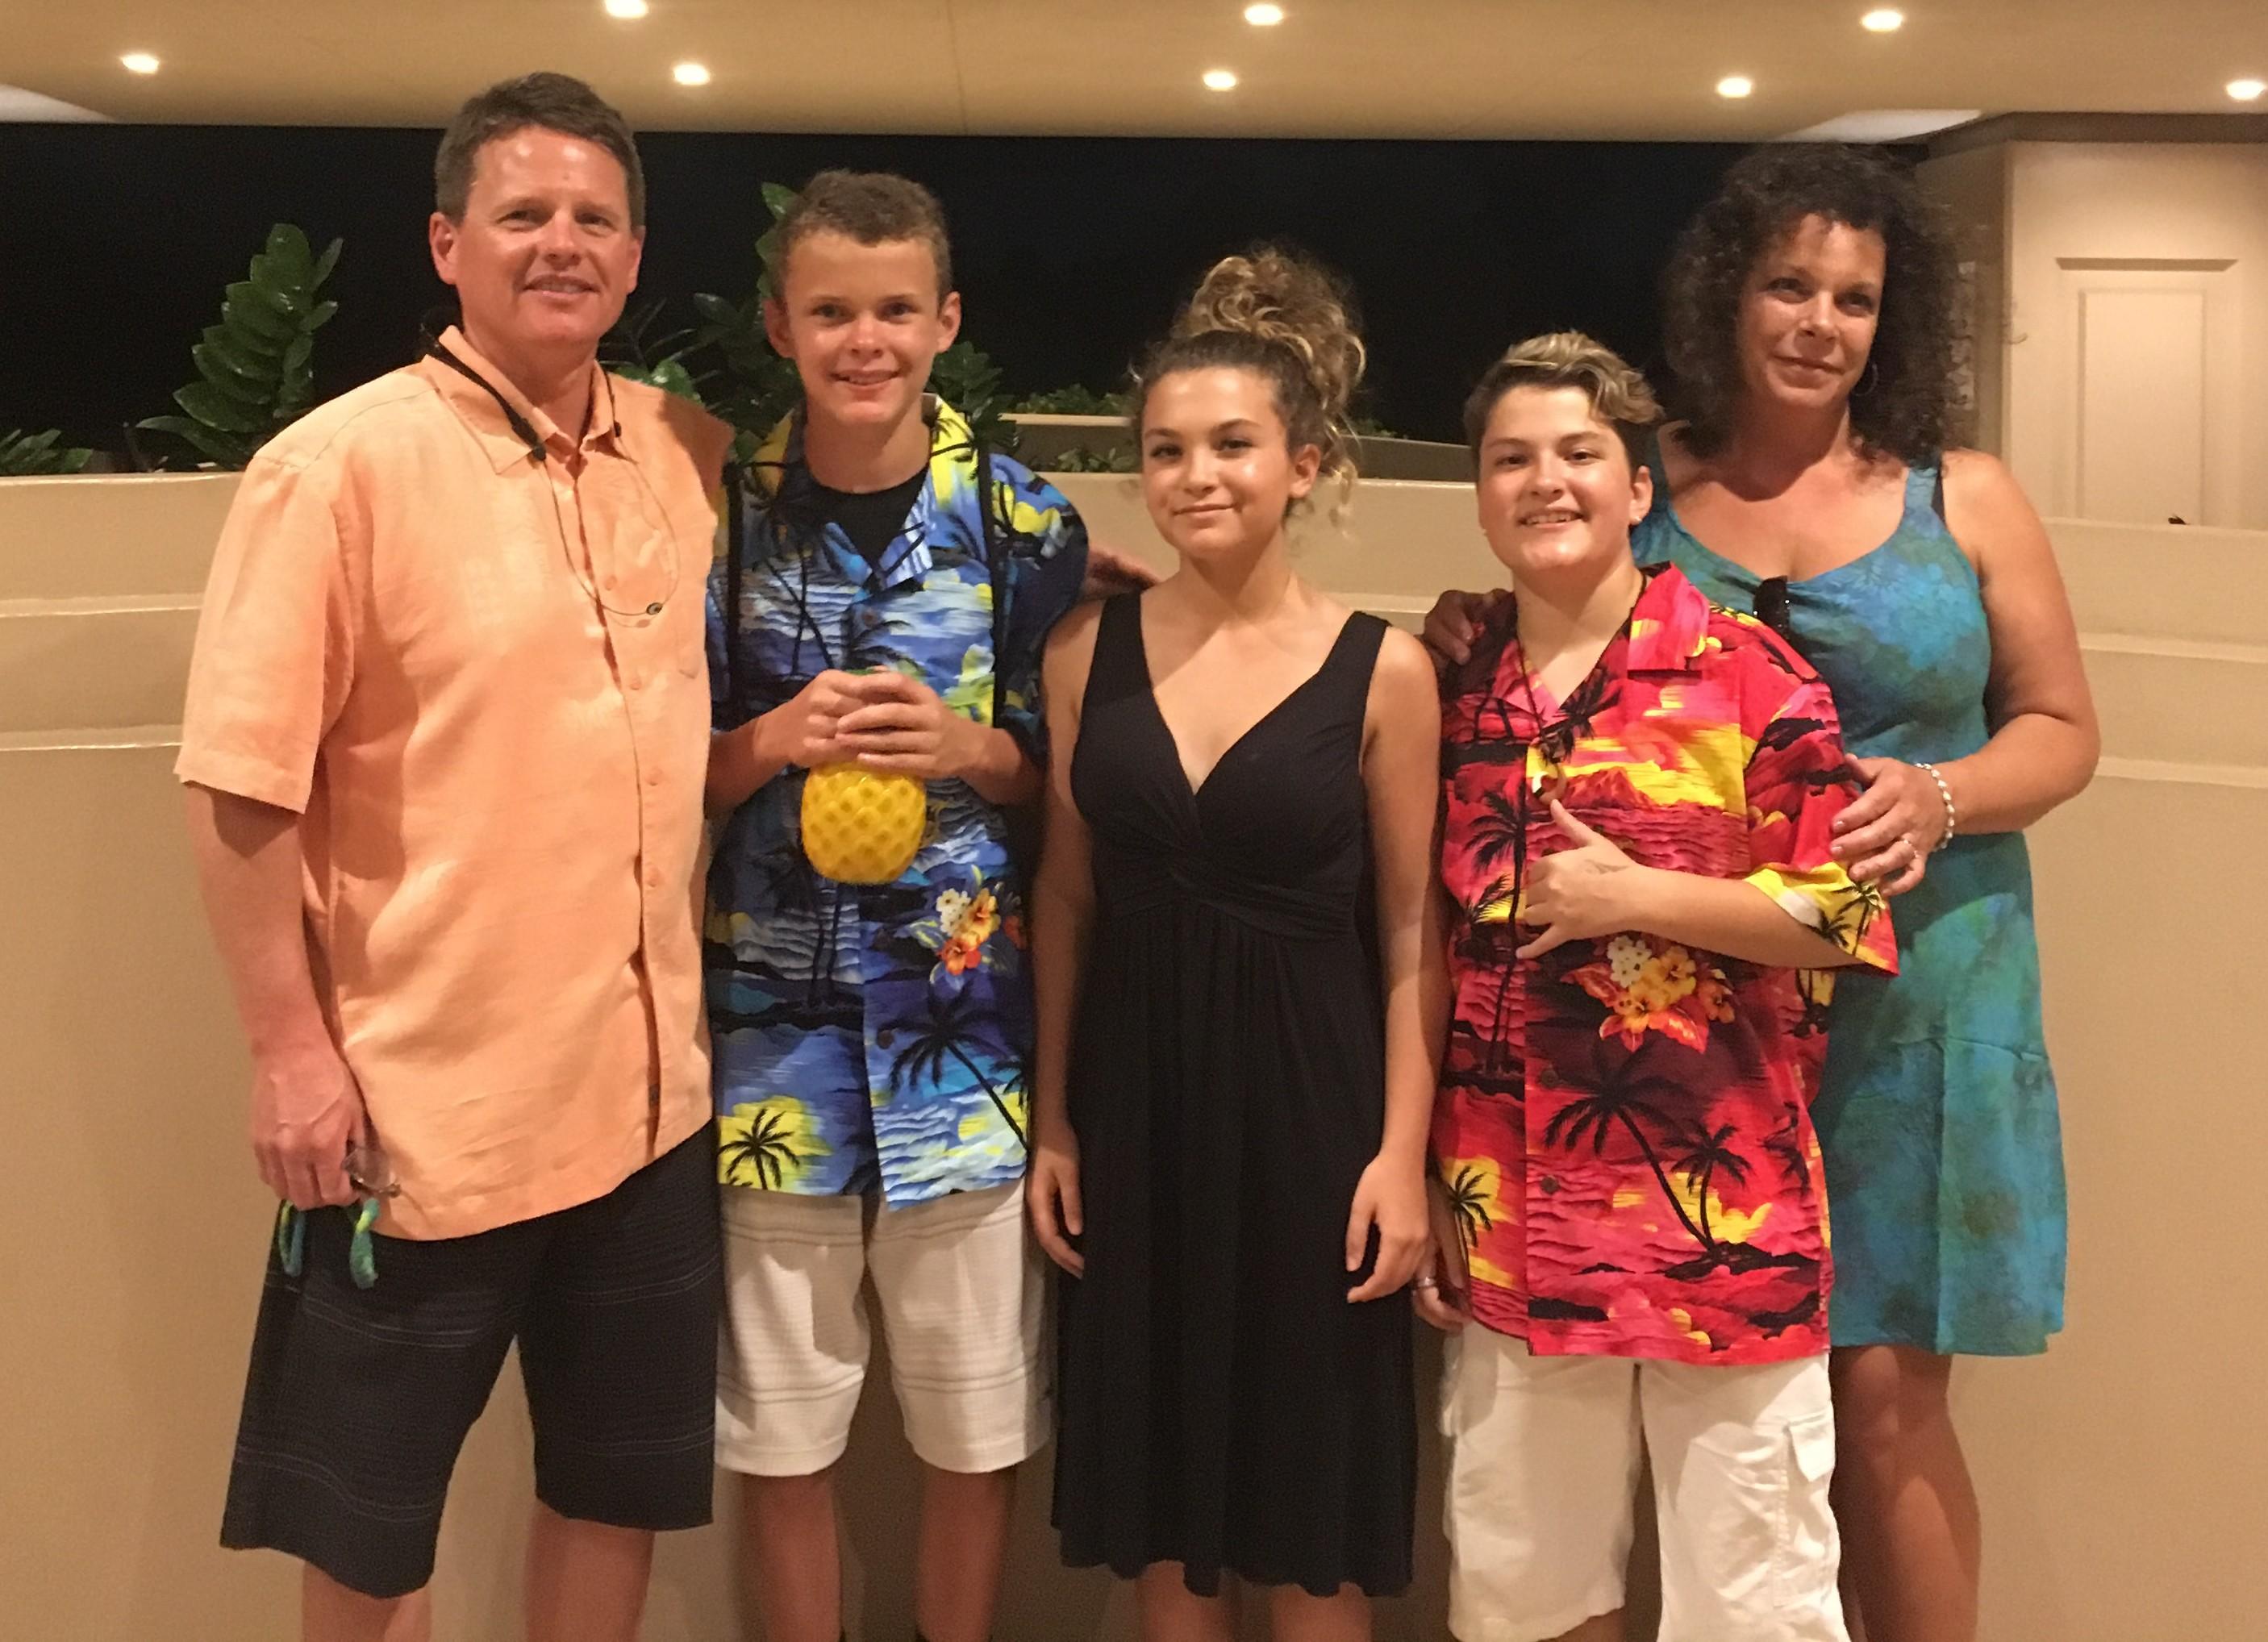 Dr Berards Family